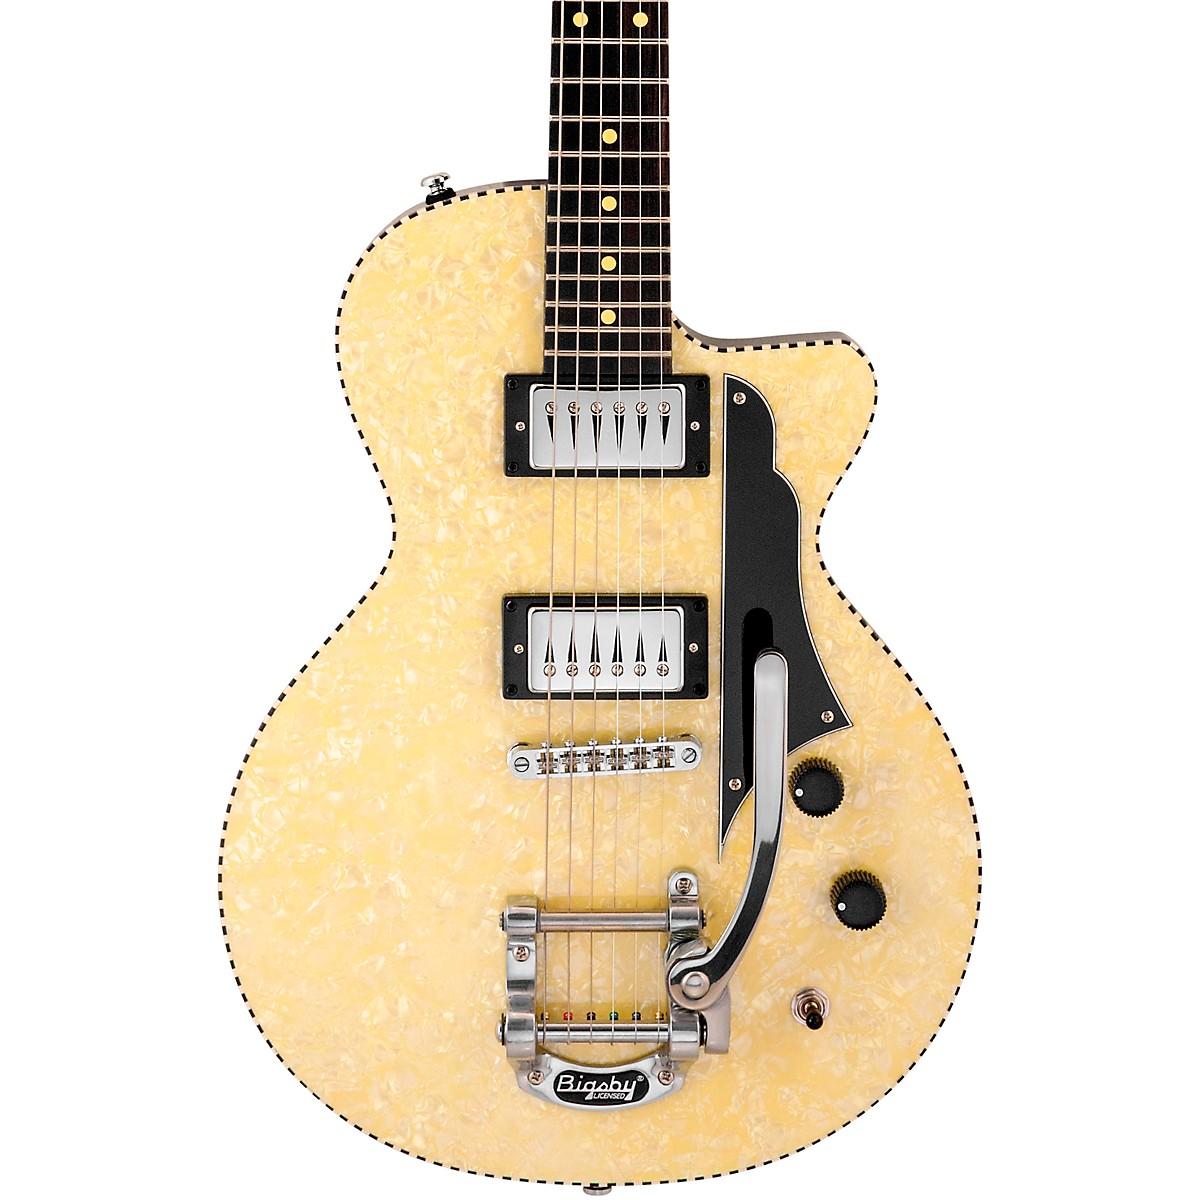 Reverend Rick Vito Signature Soul Shaker Electric Guitar